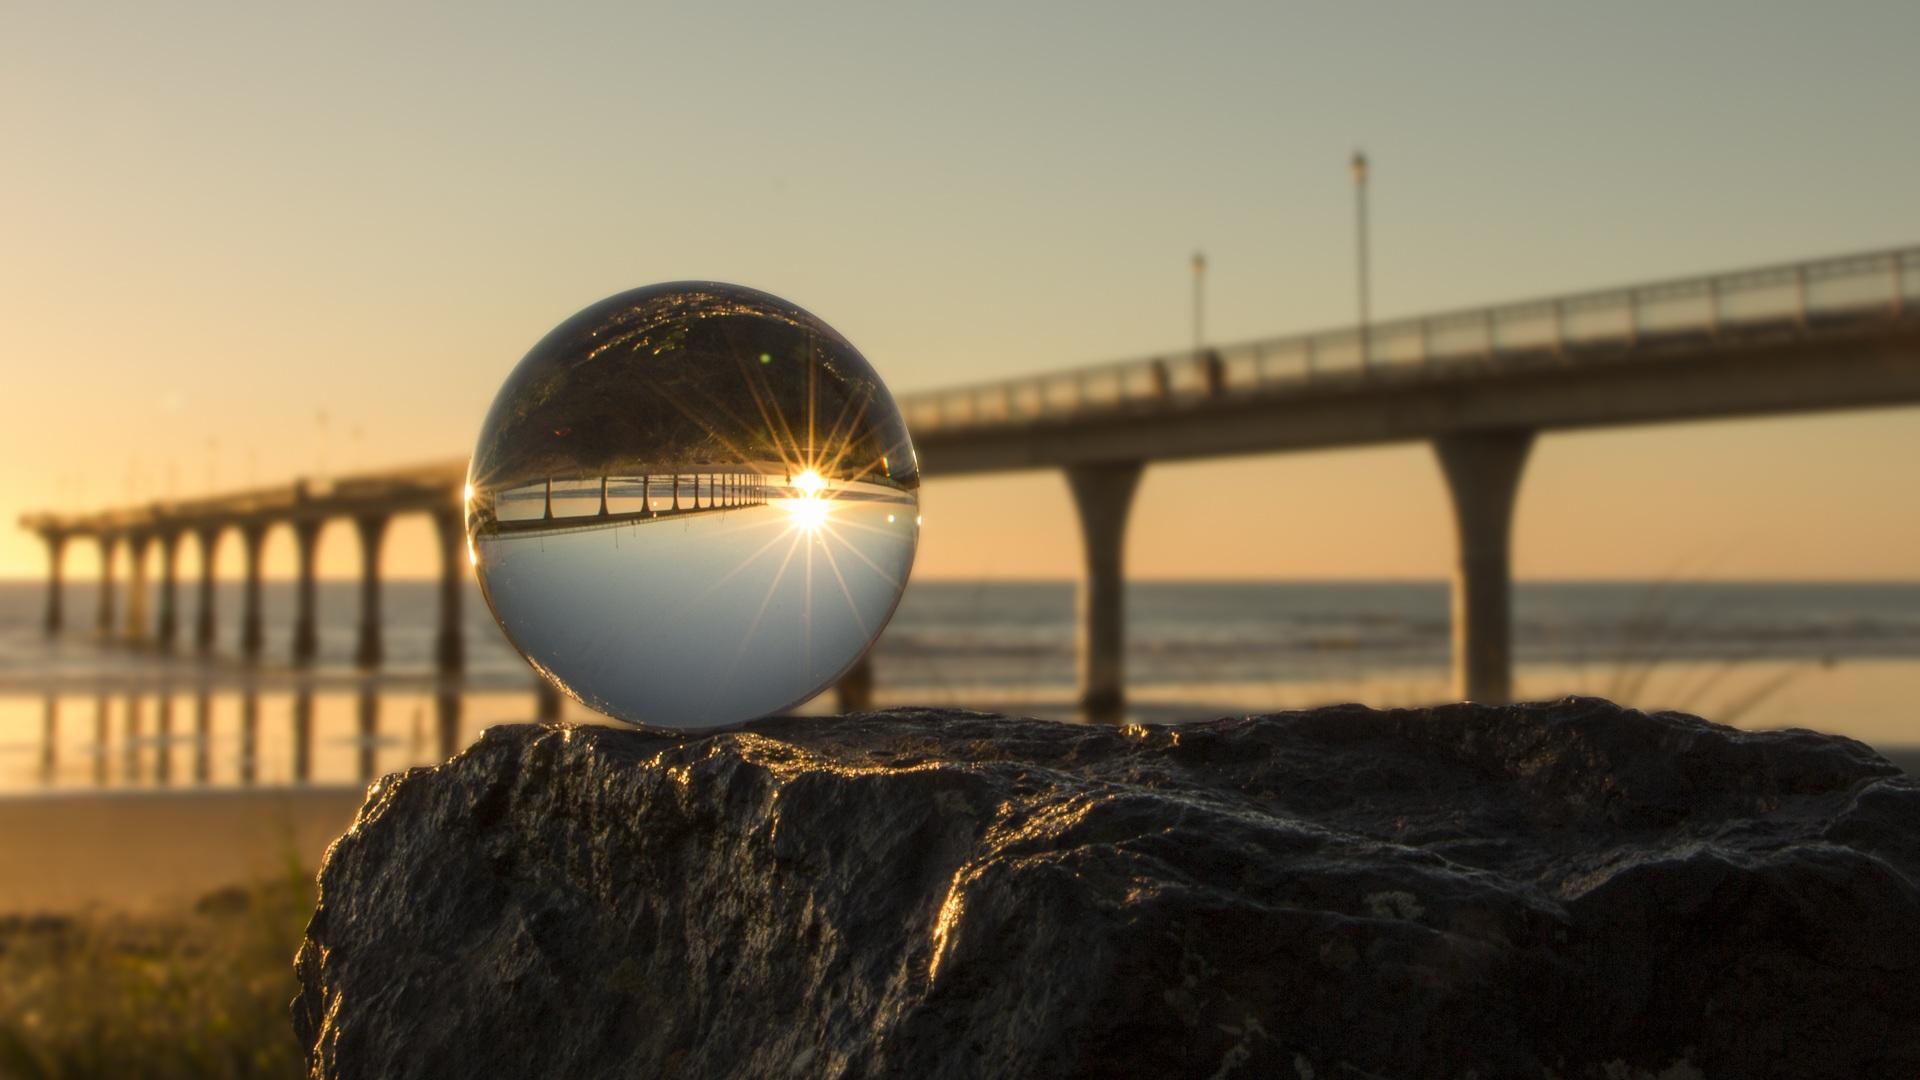 नई ब्राइटन, क्रिस्टल बॉल, पुल, सागर, चमक, आकाश, पत्थर - HD वॉलपेपर - प्रोफेसर-falken.com